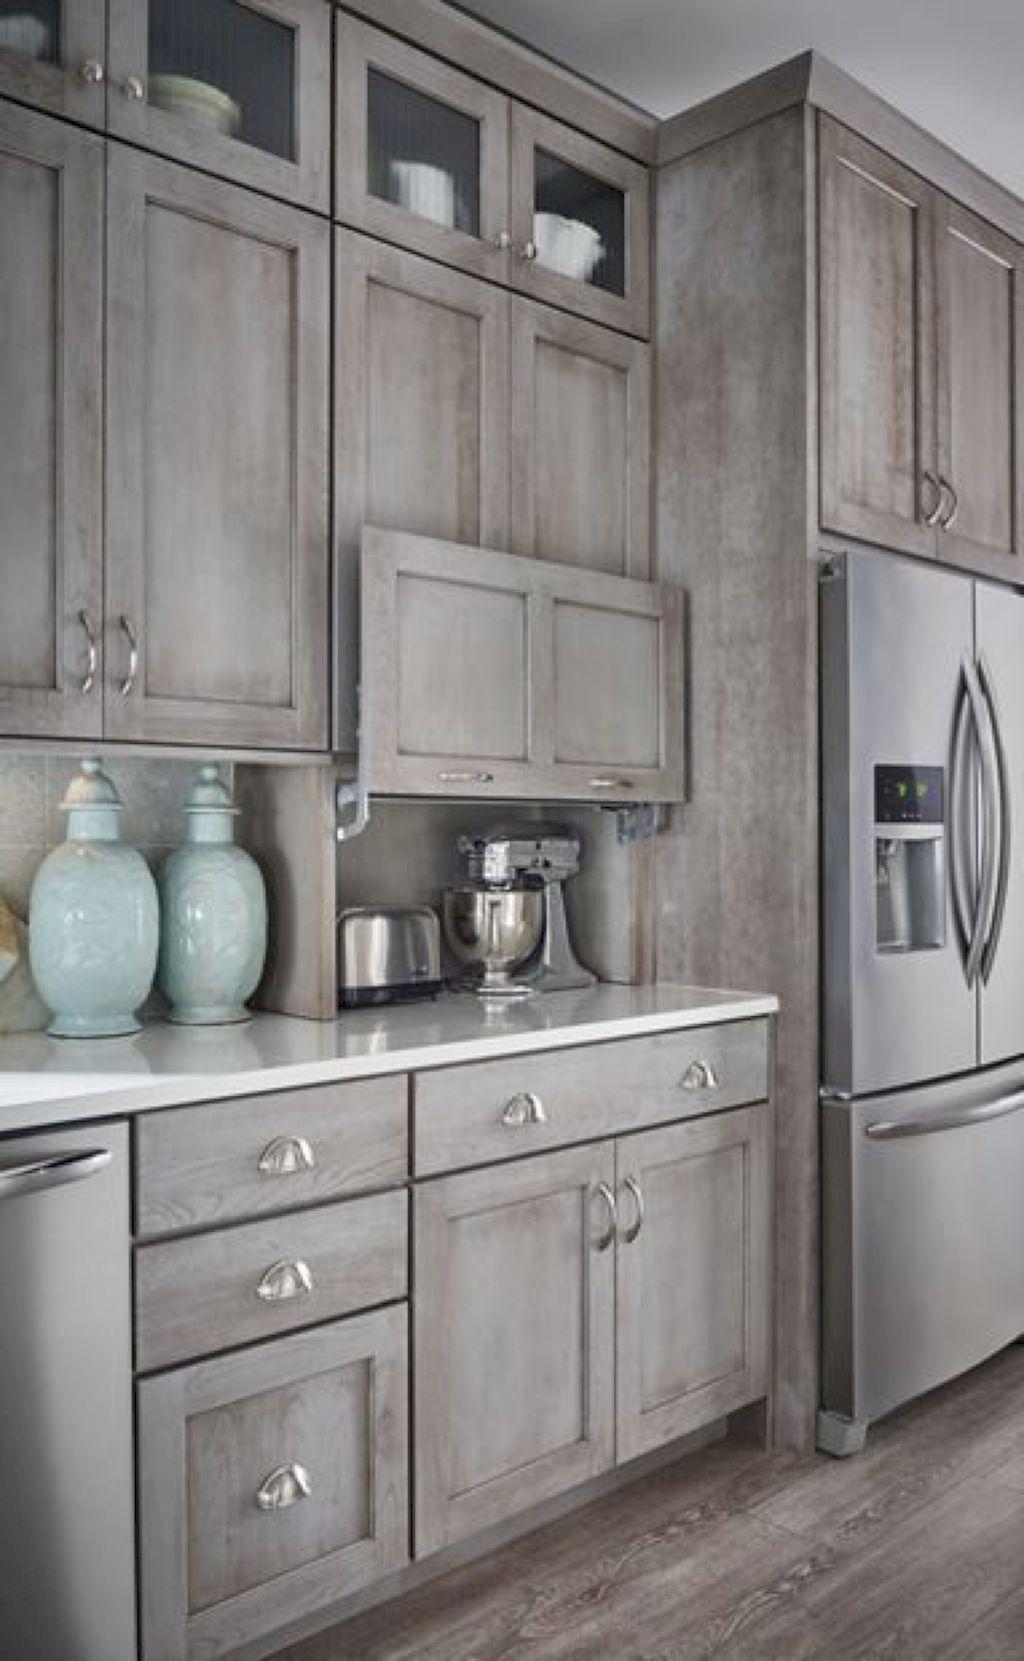 28 Modern Rustic Farmhouse Kitchen Cabinets Ideas Rustic Kitchen Cabinets Rustic Kitchen Rustic Farmhouse Kitchen Cabinets